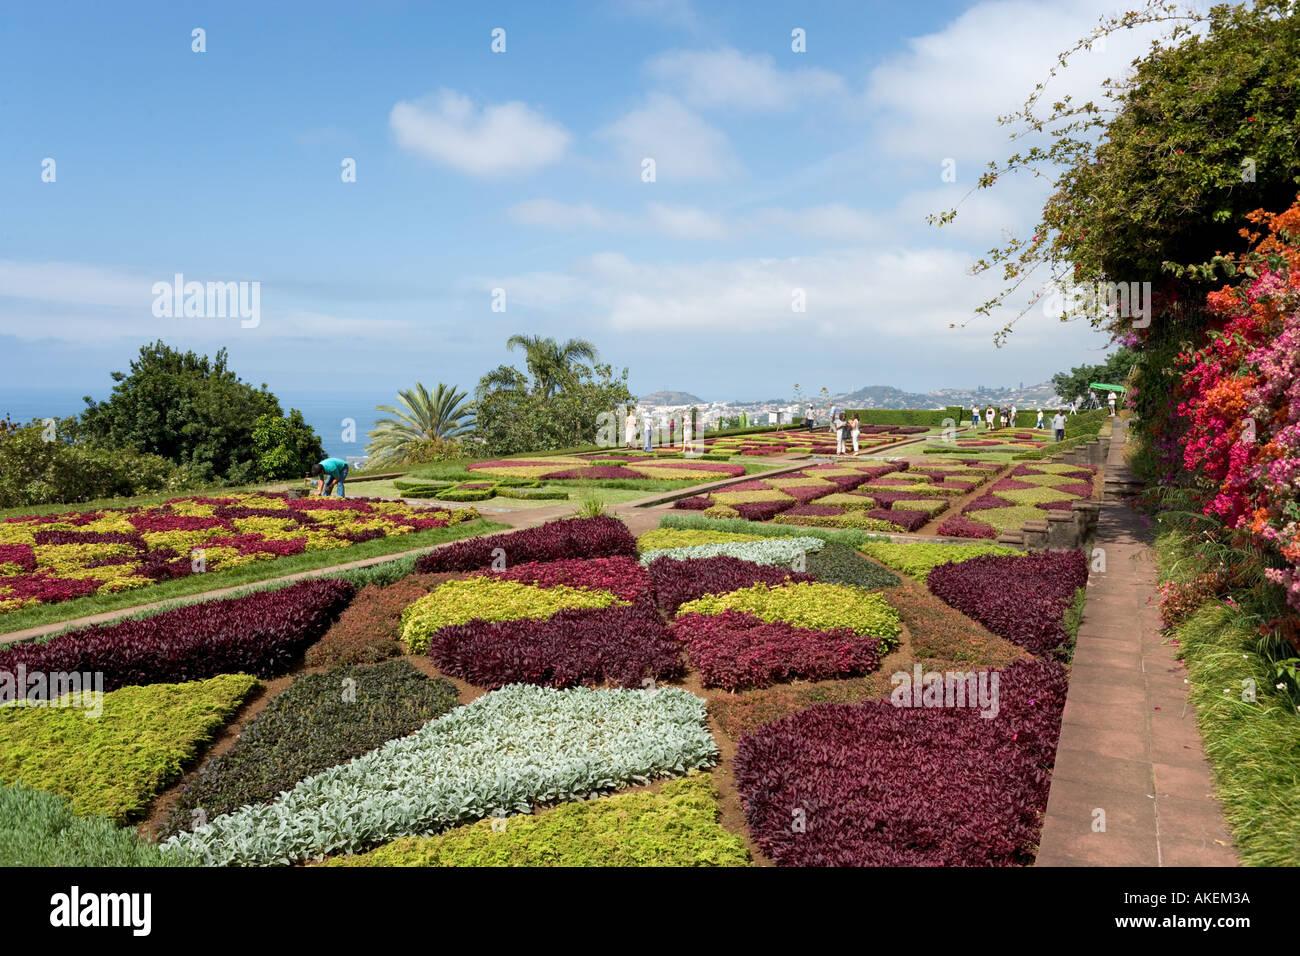 Botanische Gärten, Funchal, Madeira, Portugal Stockbild